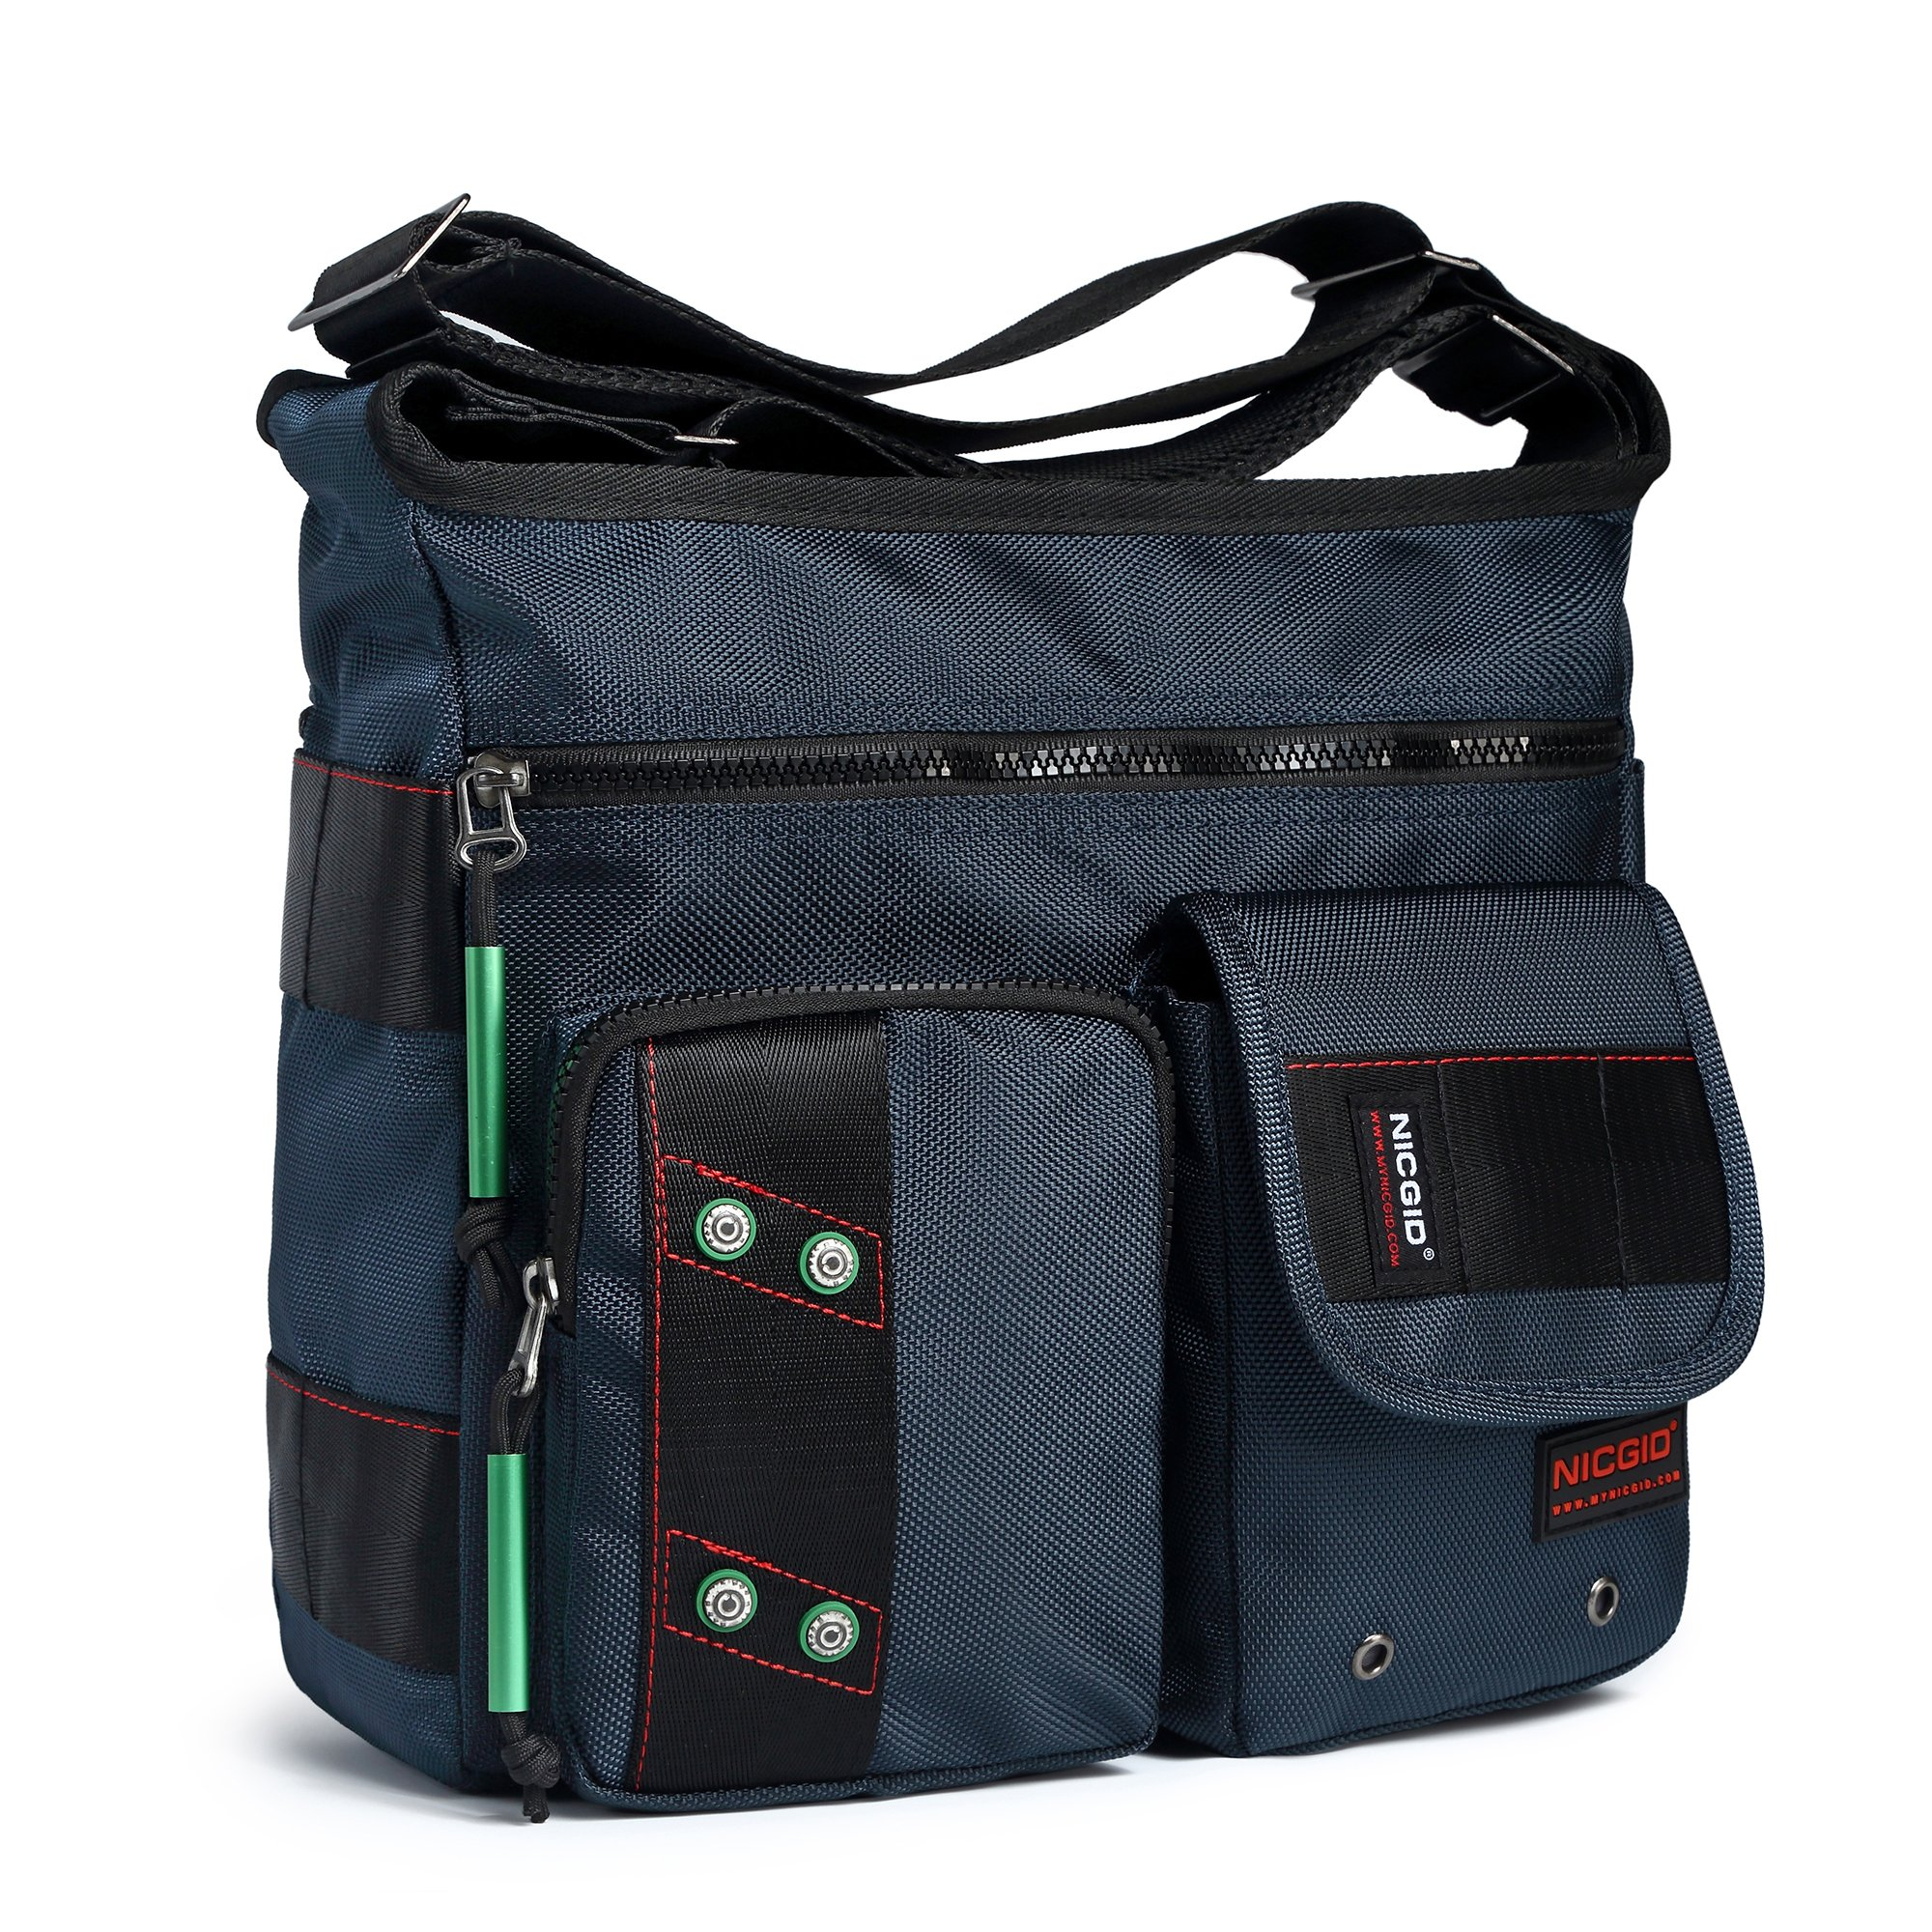 Crossbody Purse Bags, Messenger Crossbody Bag Multi Pocket Shoulder Bag Travel Handbags for Men Women